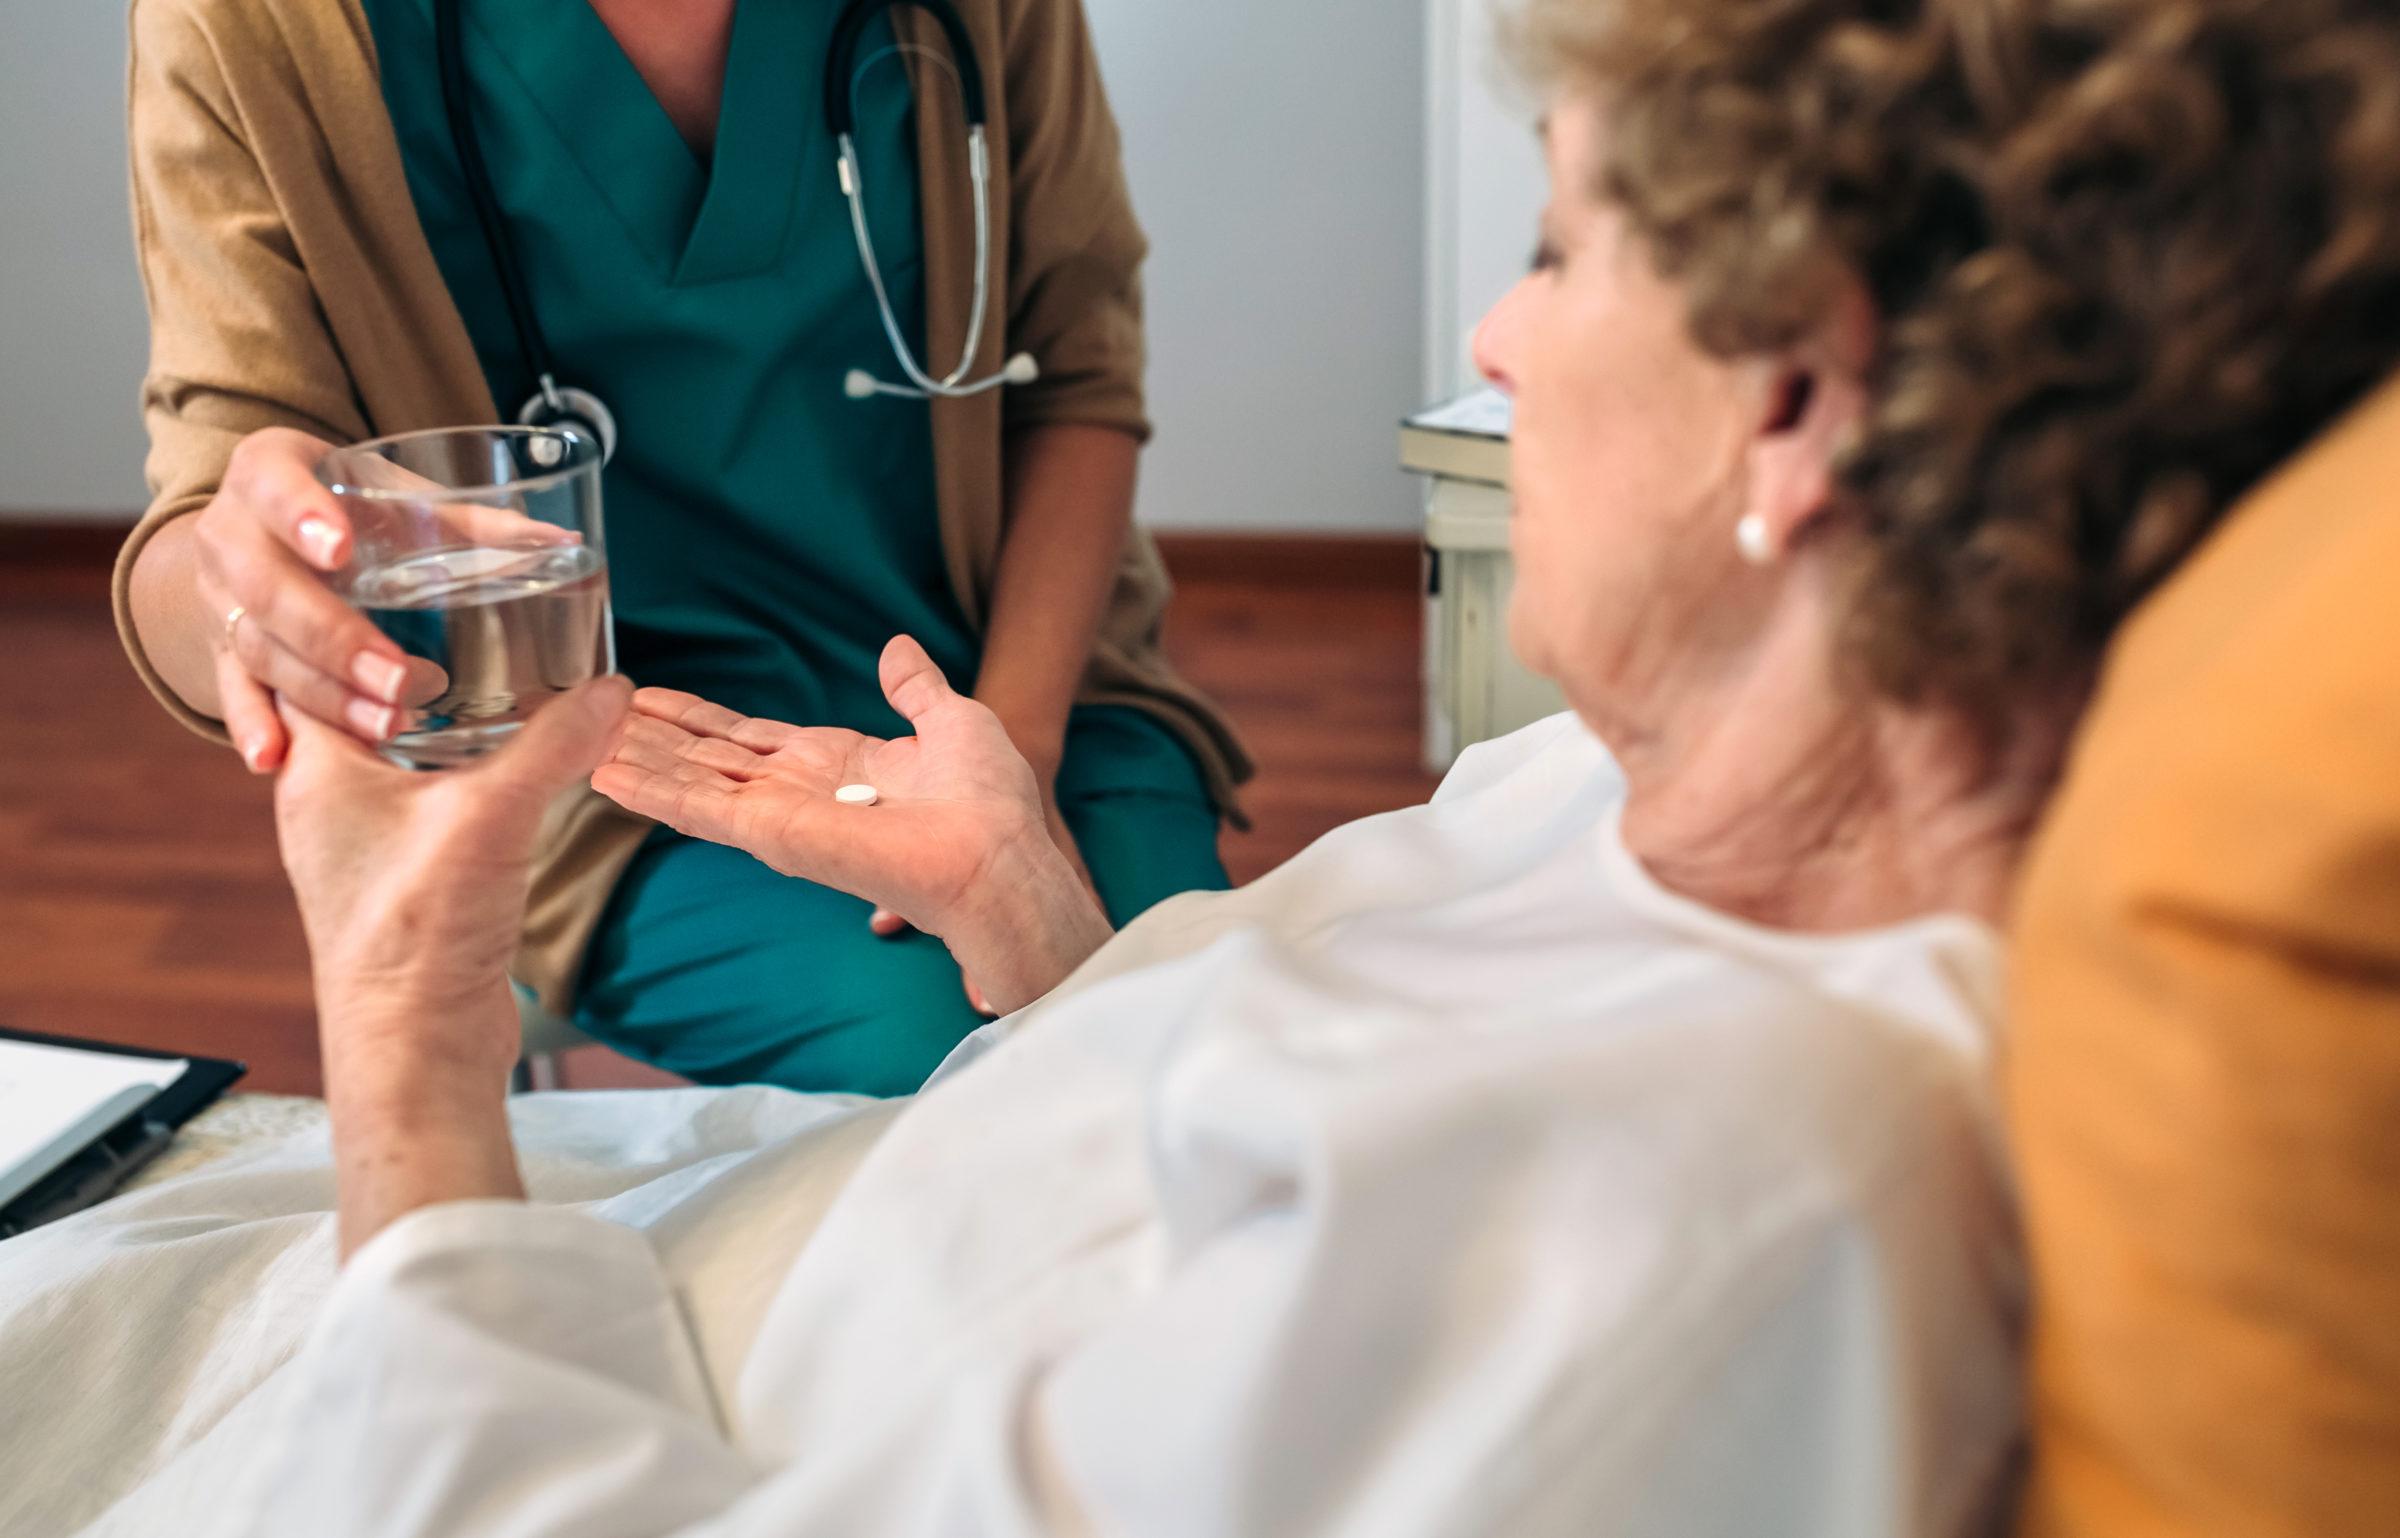 doctor giving medication dose to elderly patient BNDR4JD